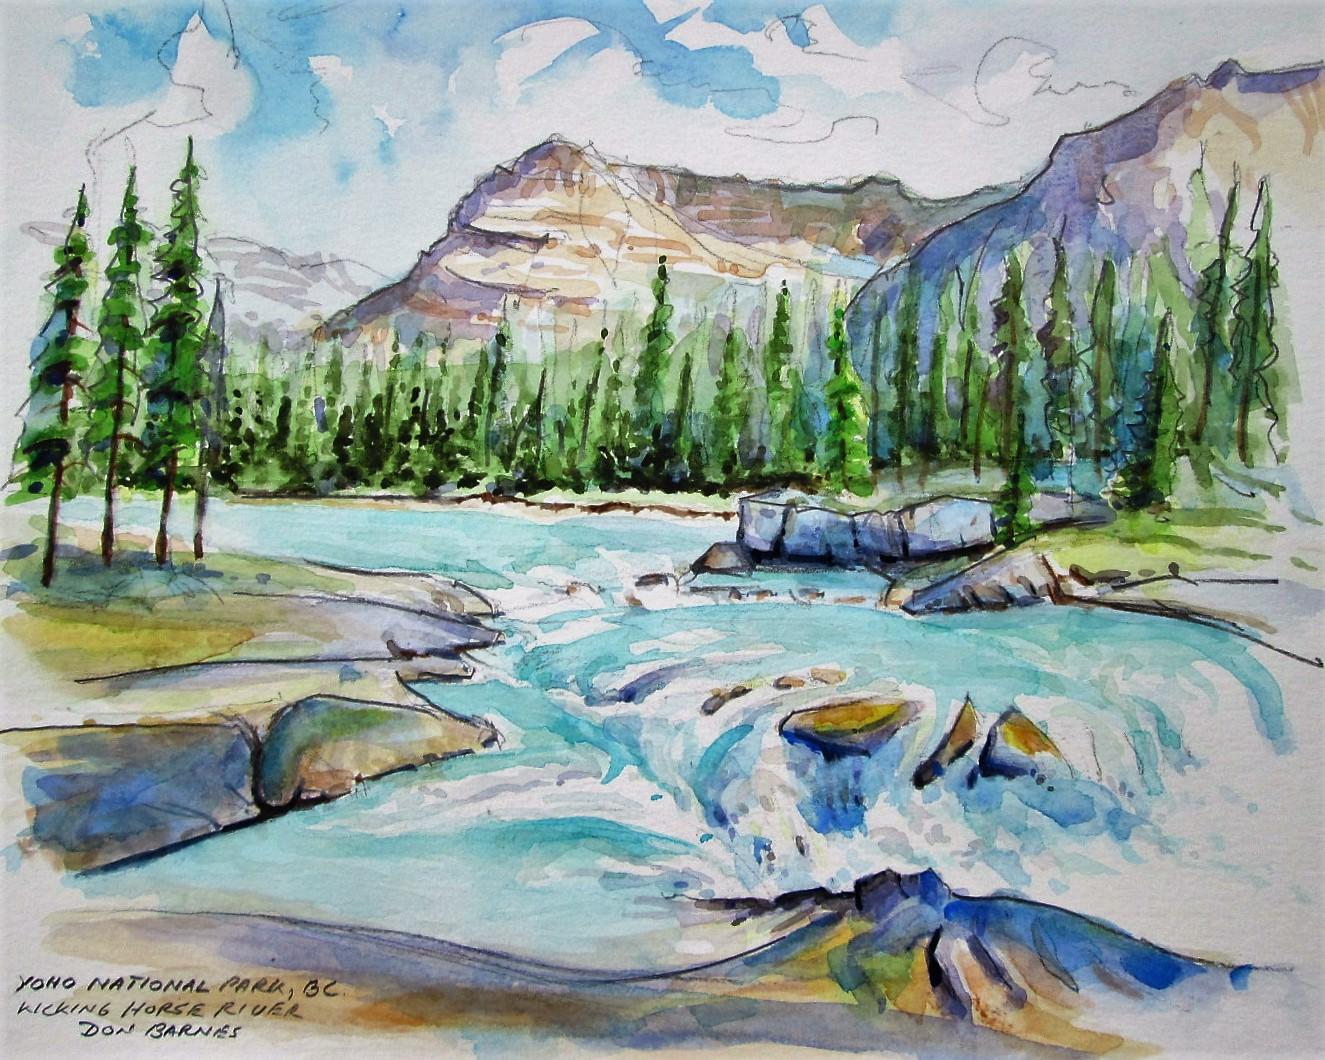 Kicking horse river sketch pencil and watercolor